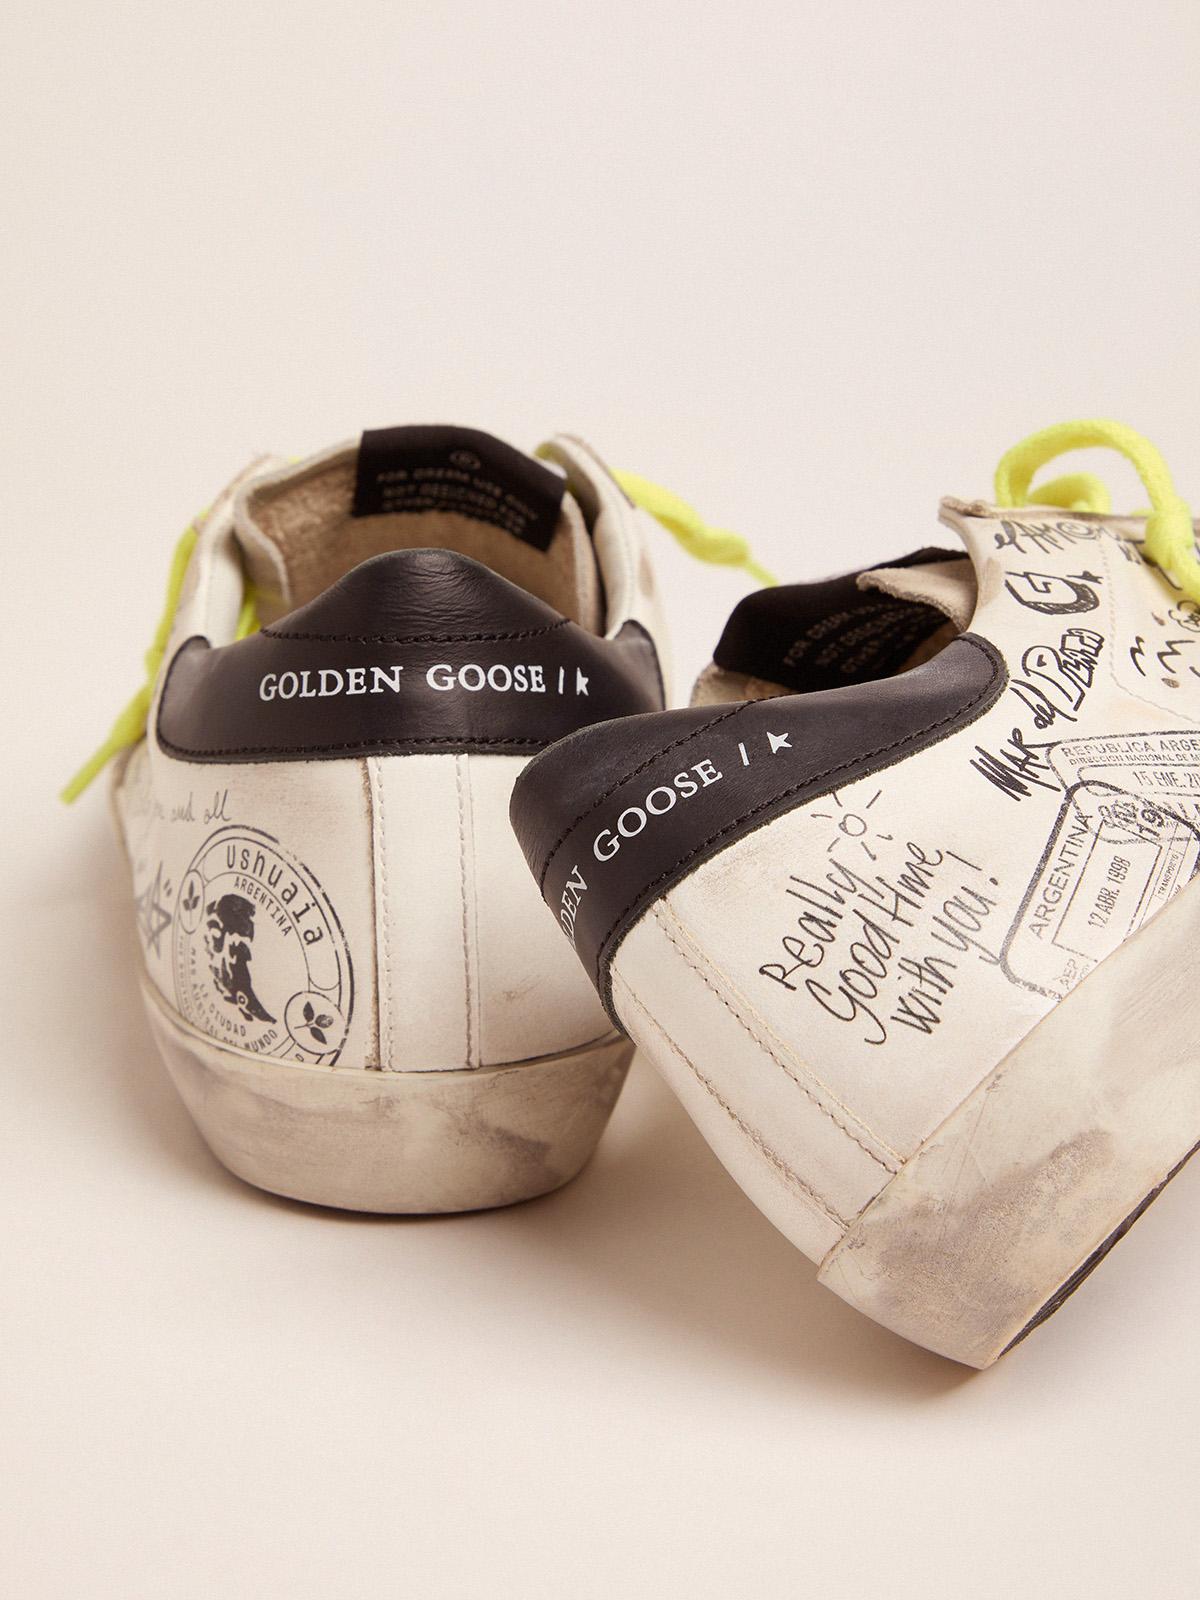 Golden Goose - 여성 Super-Star 스니커즈, 그래피티 여행 in